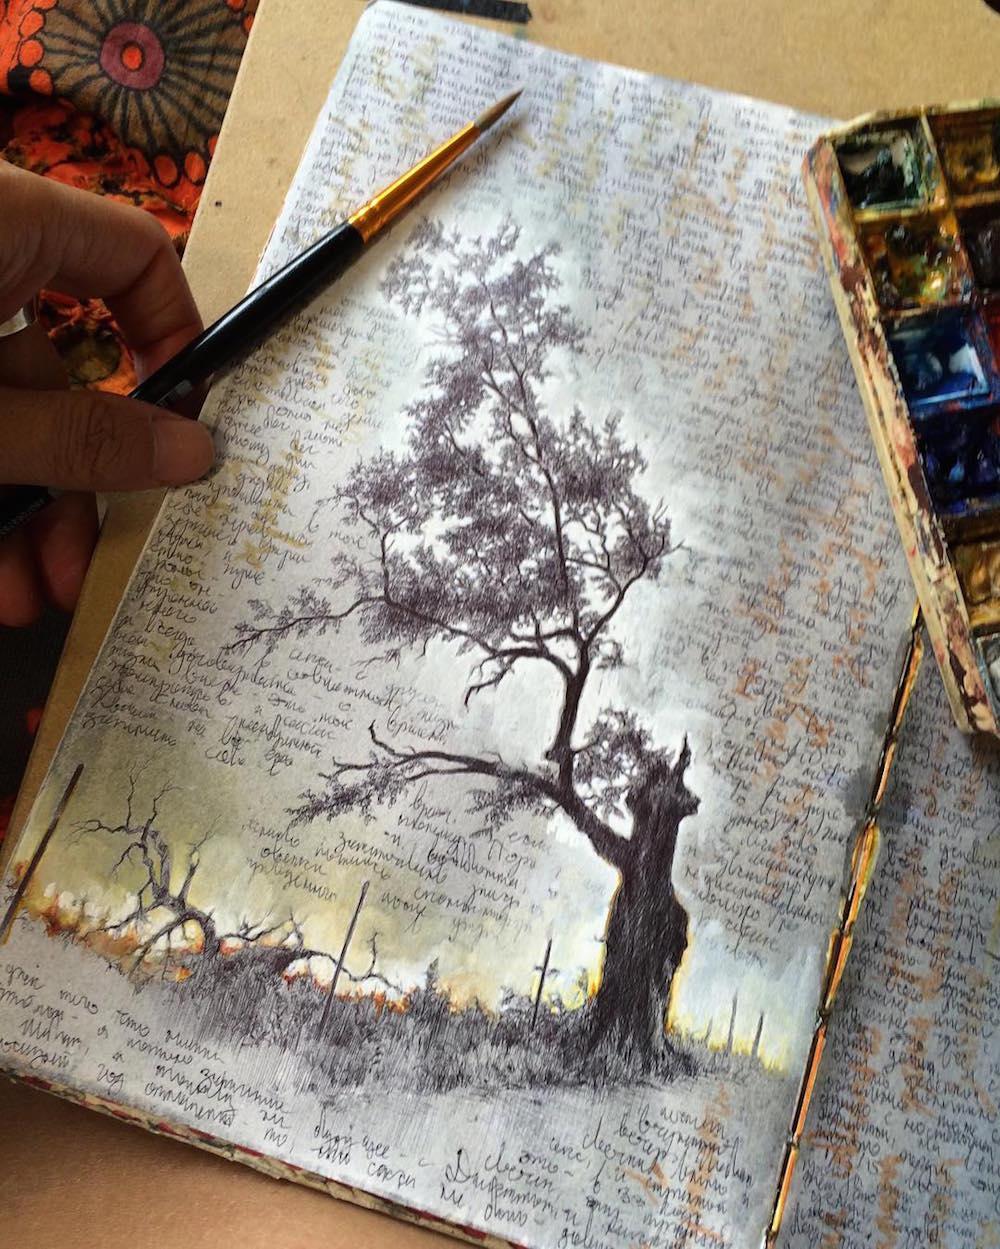 dina_brodksy_diary_sketchbook_